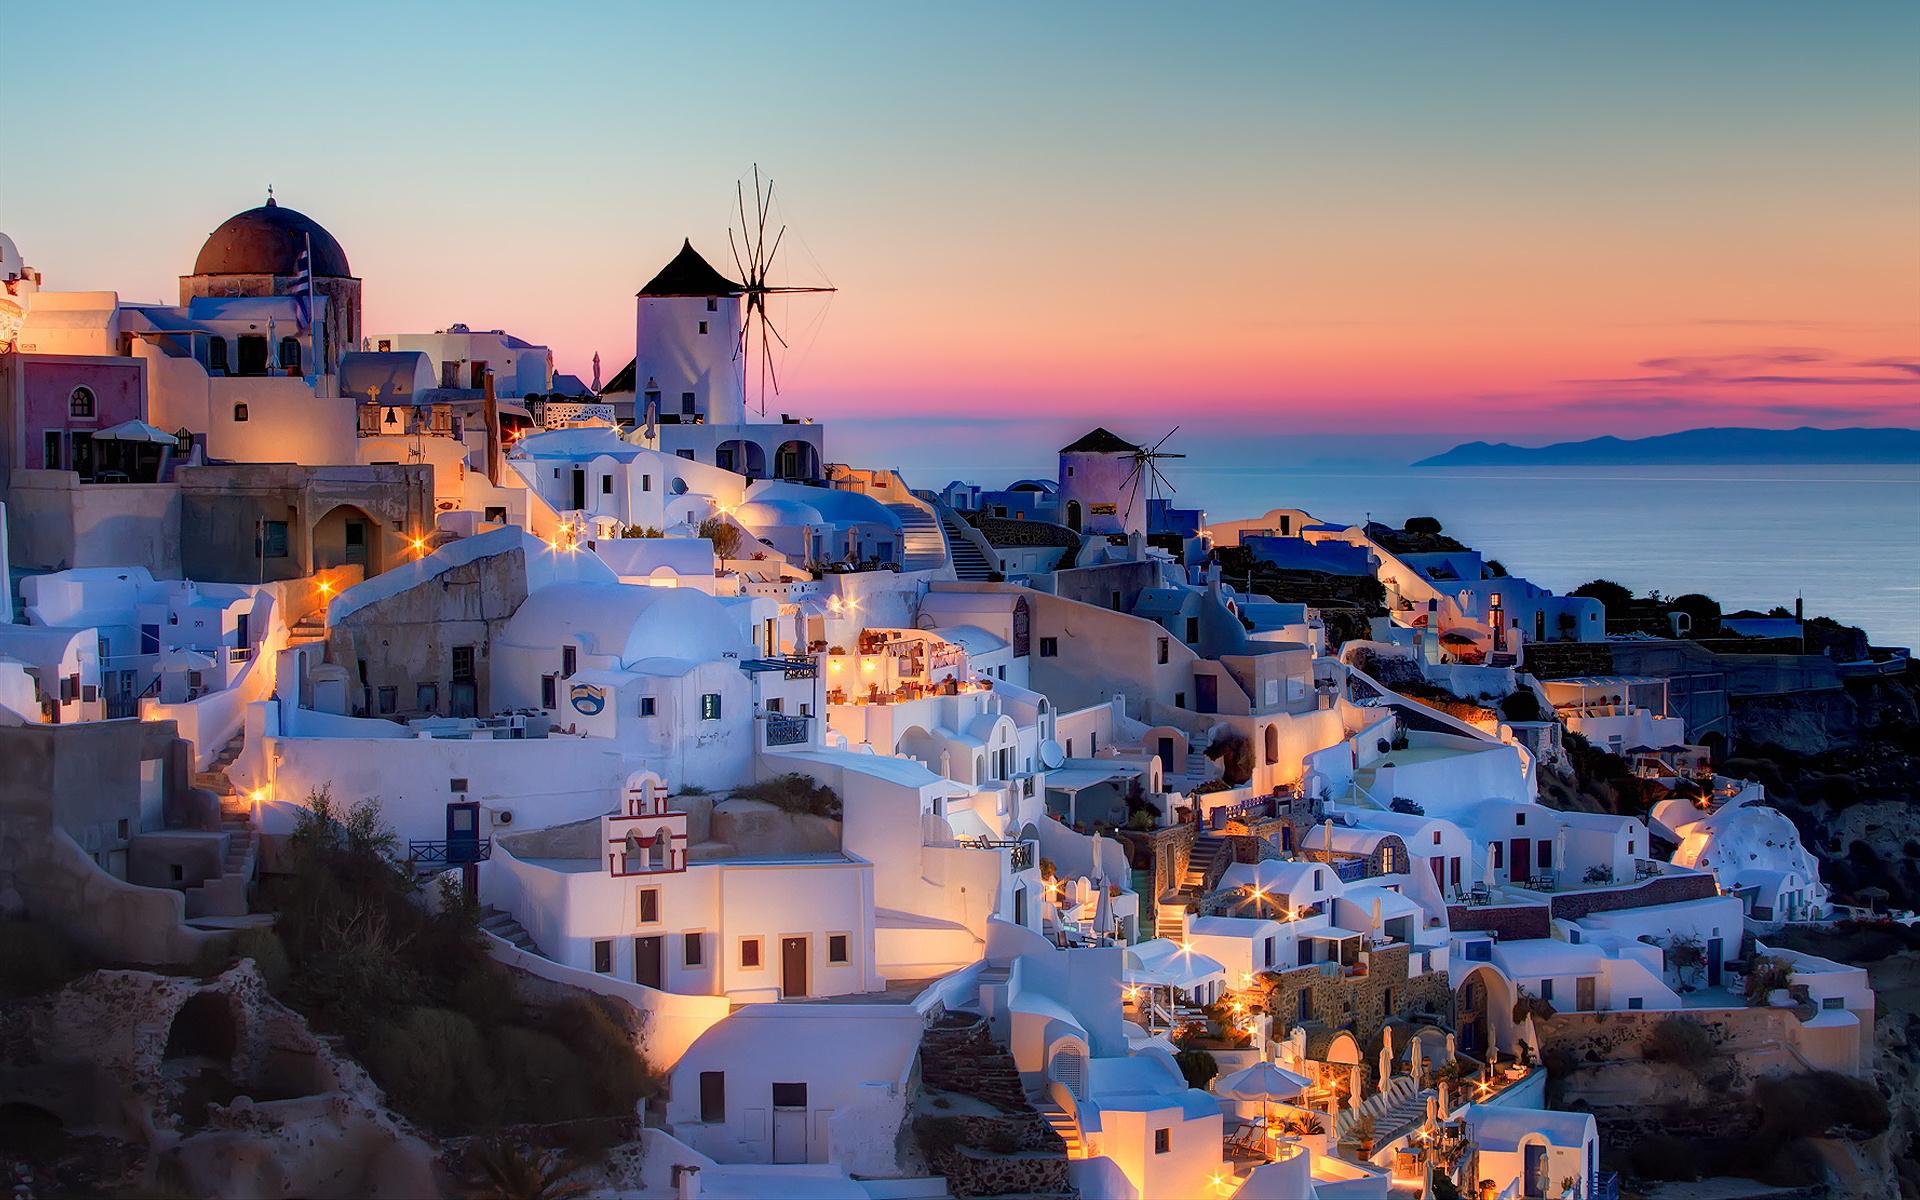 Grčka Santorini letovanje hoteli i apartmani Kamari, Fira luksuzno putovanje